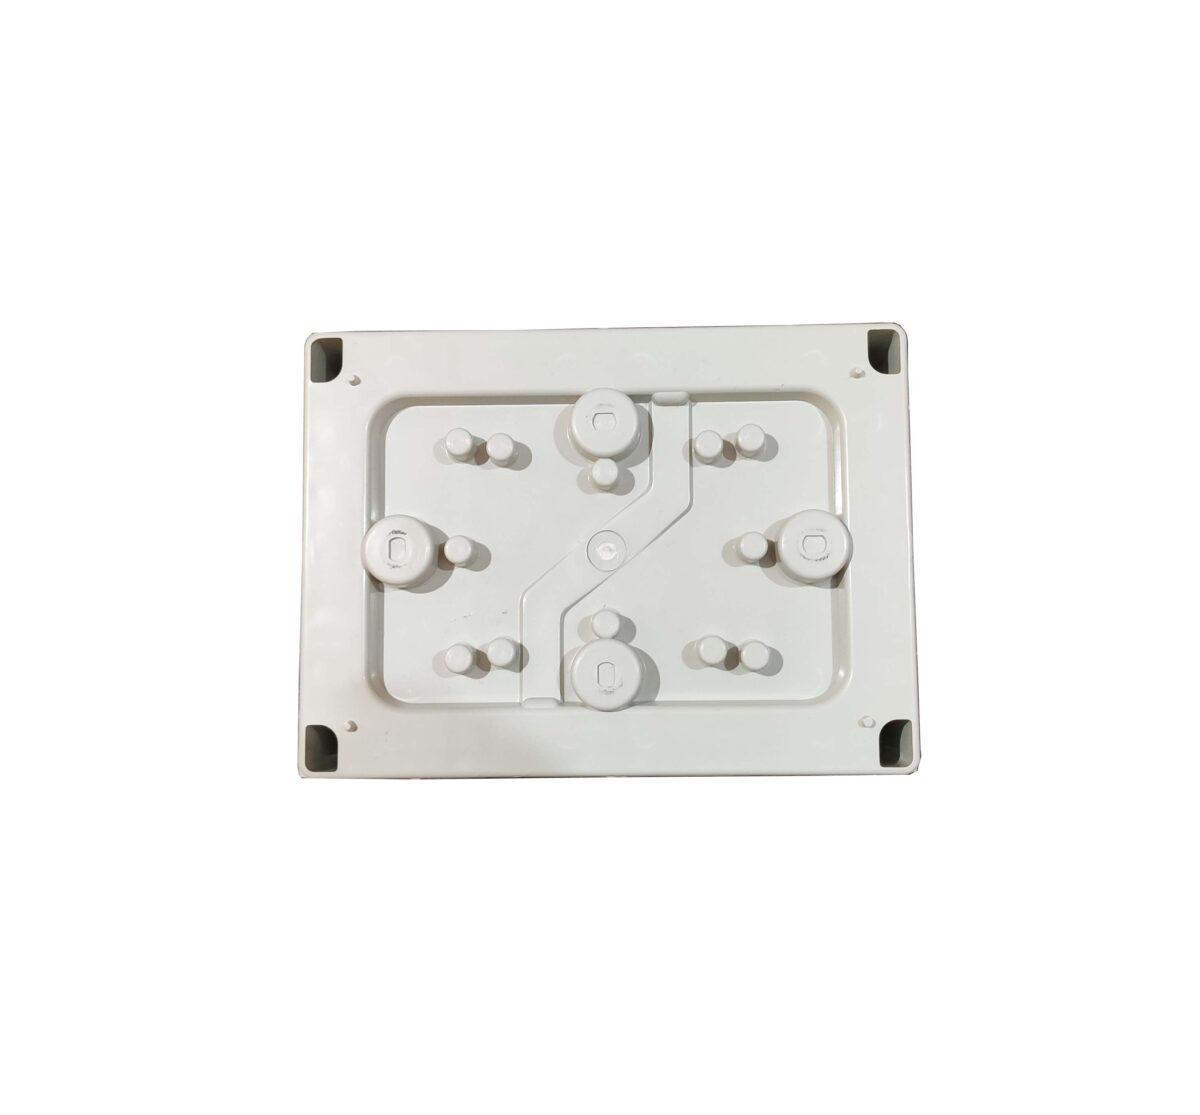 EnclosureCabinet-160x120x70 mm-IP-65 sharvielectronics.com